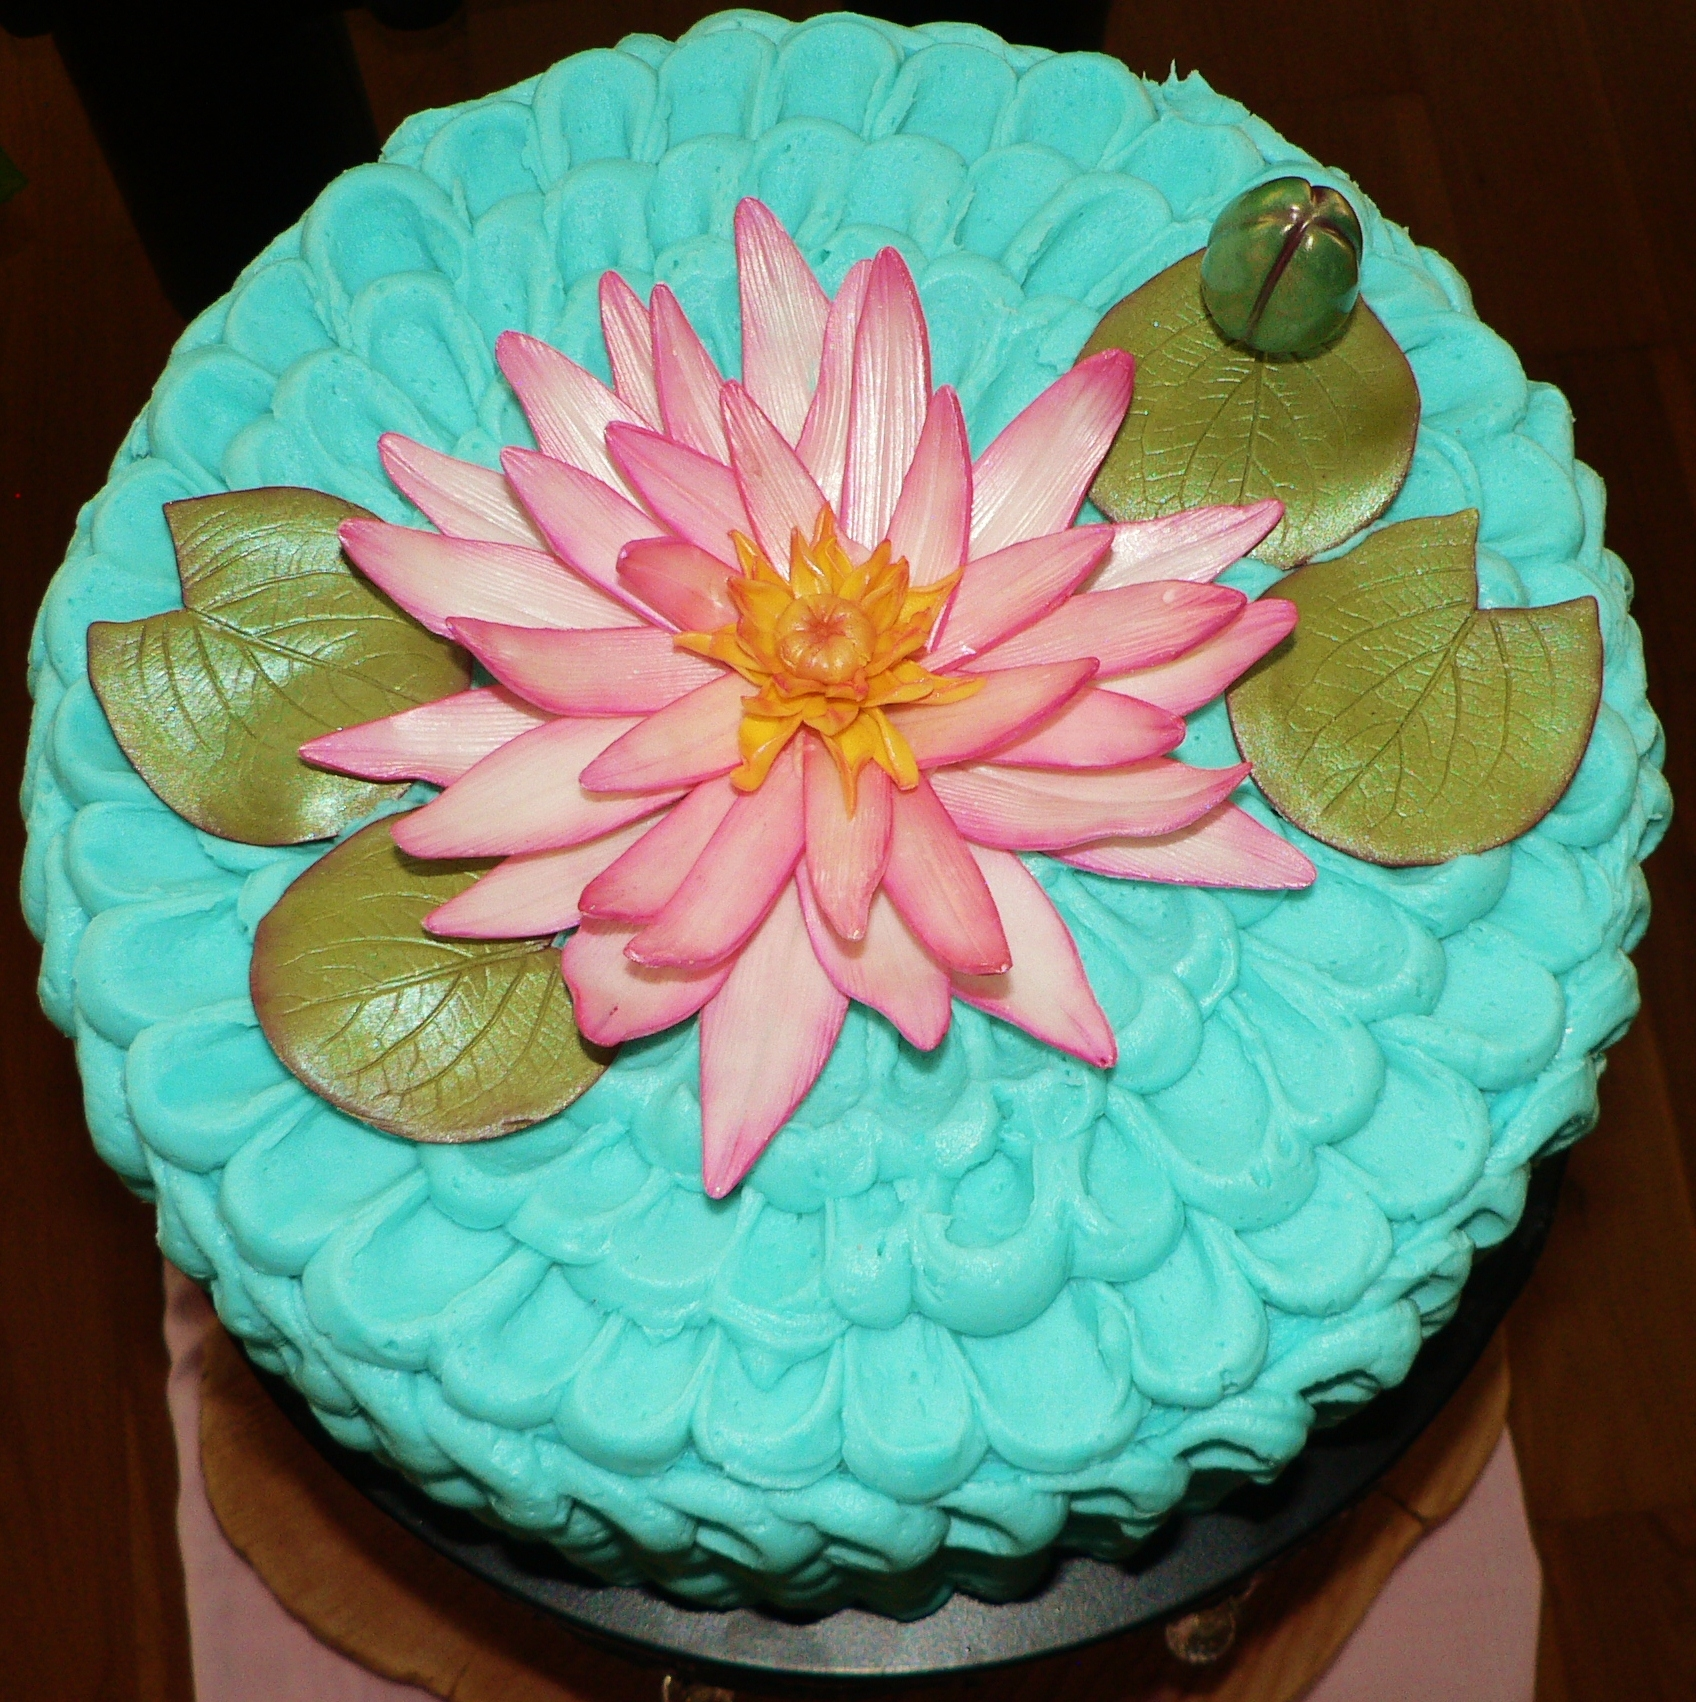 Red Lotus Cake Design : Lotus Flower Birthday Cake! - CakeCentral.com